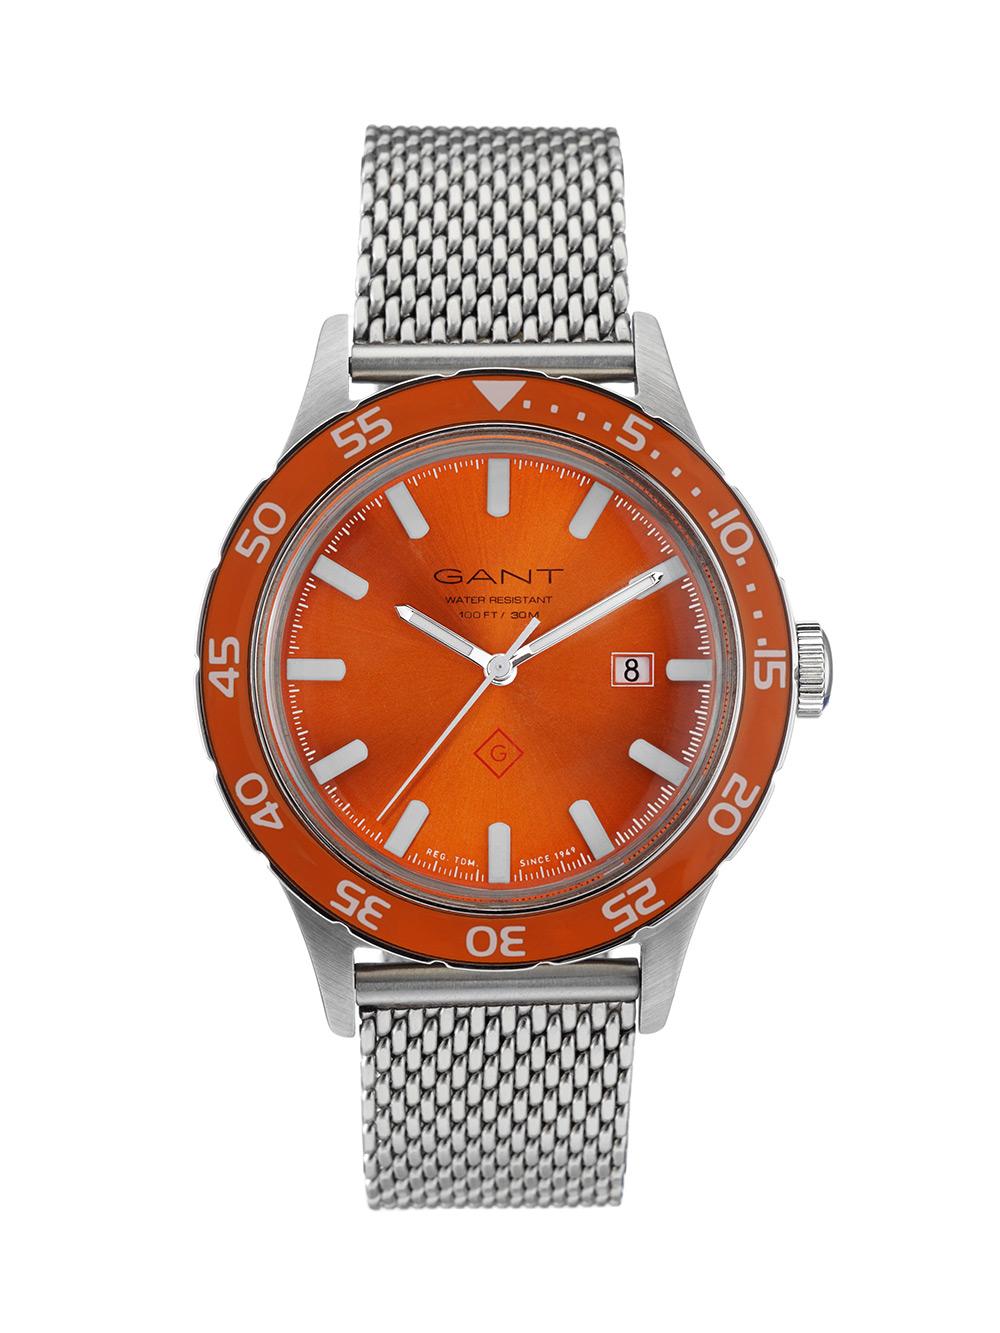 gant-rugger-las-watch-04